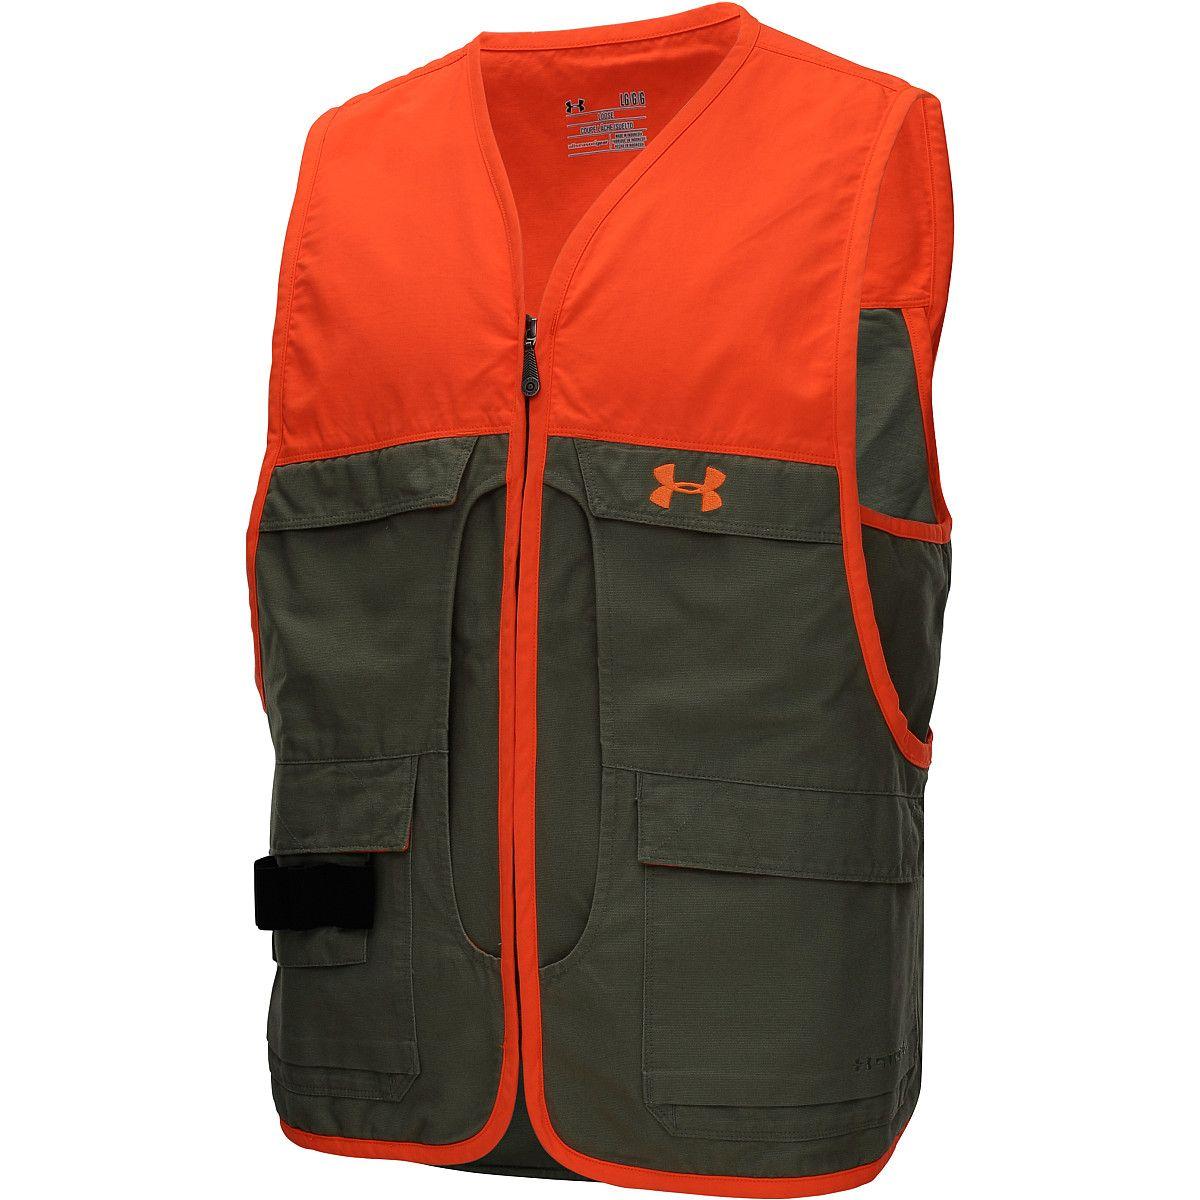 under armour blaze orange vest